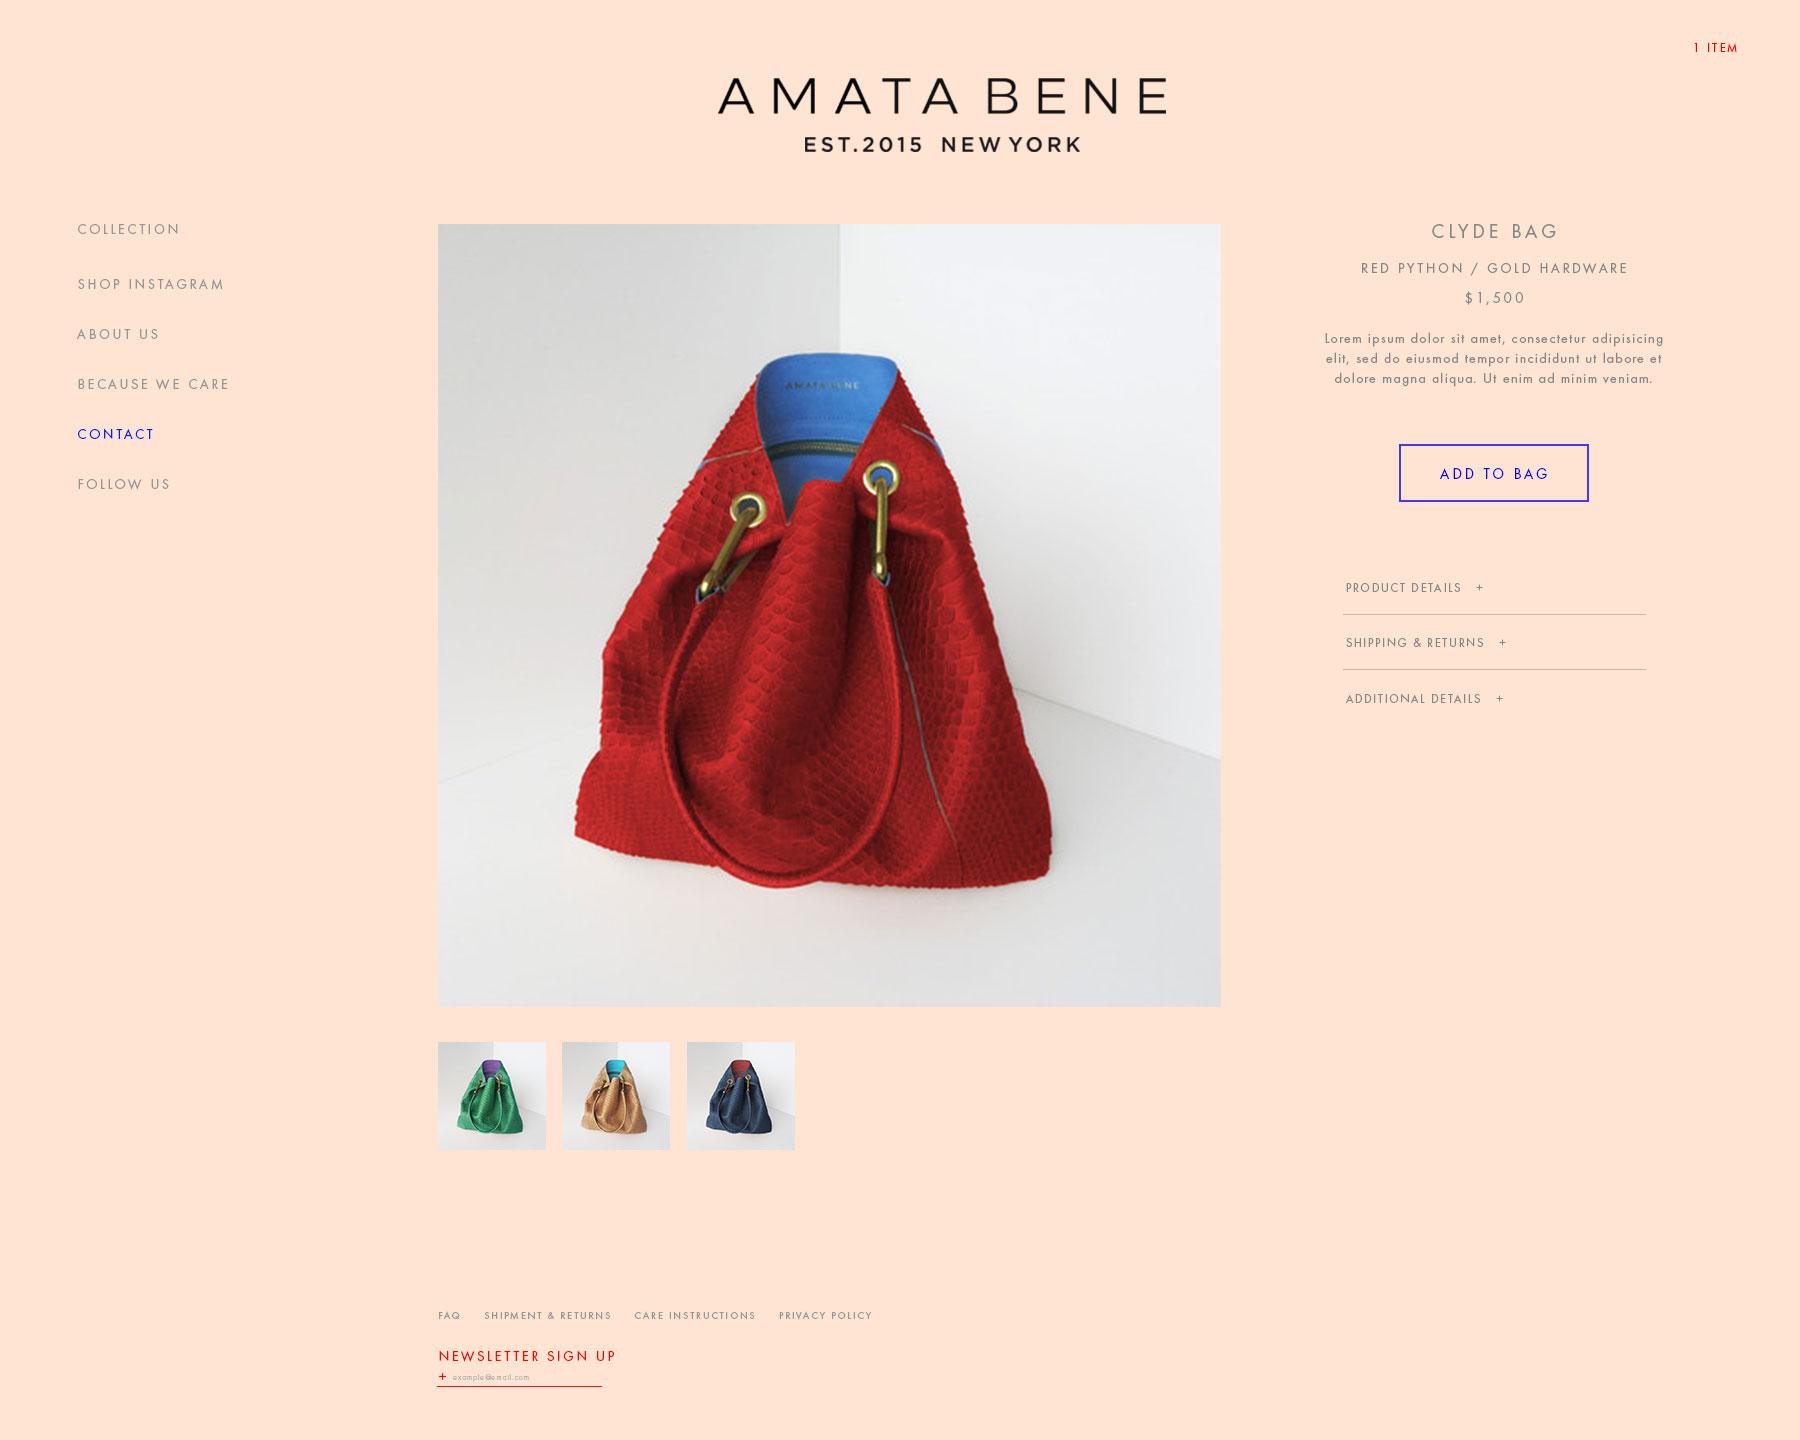 4AmataBene_product_DTLS.jpg